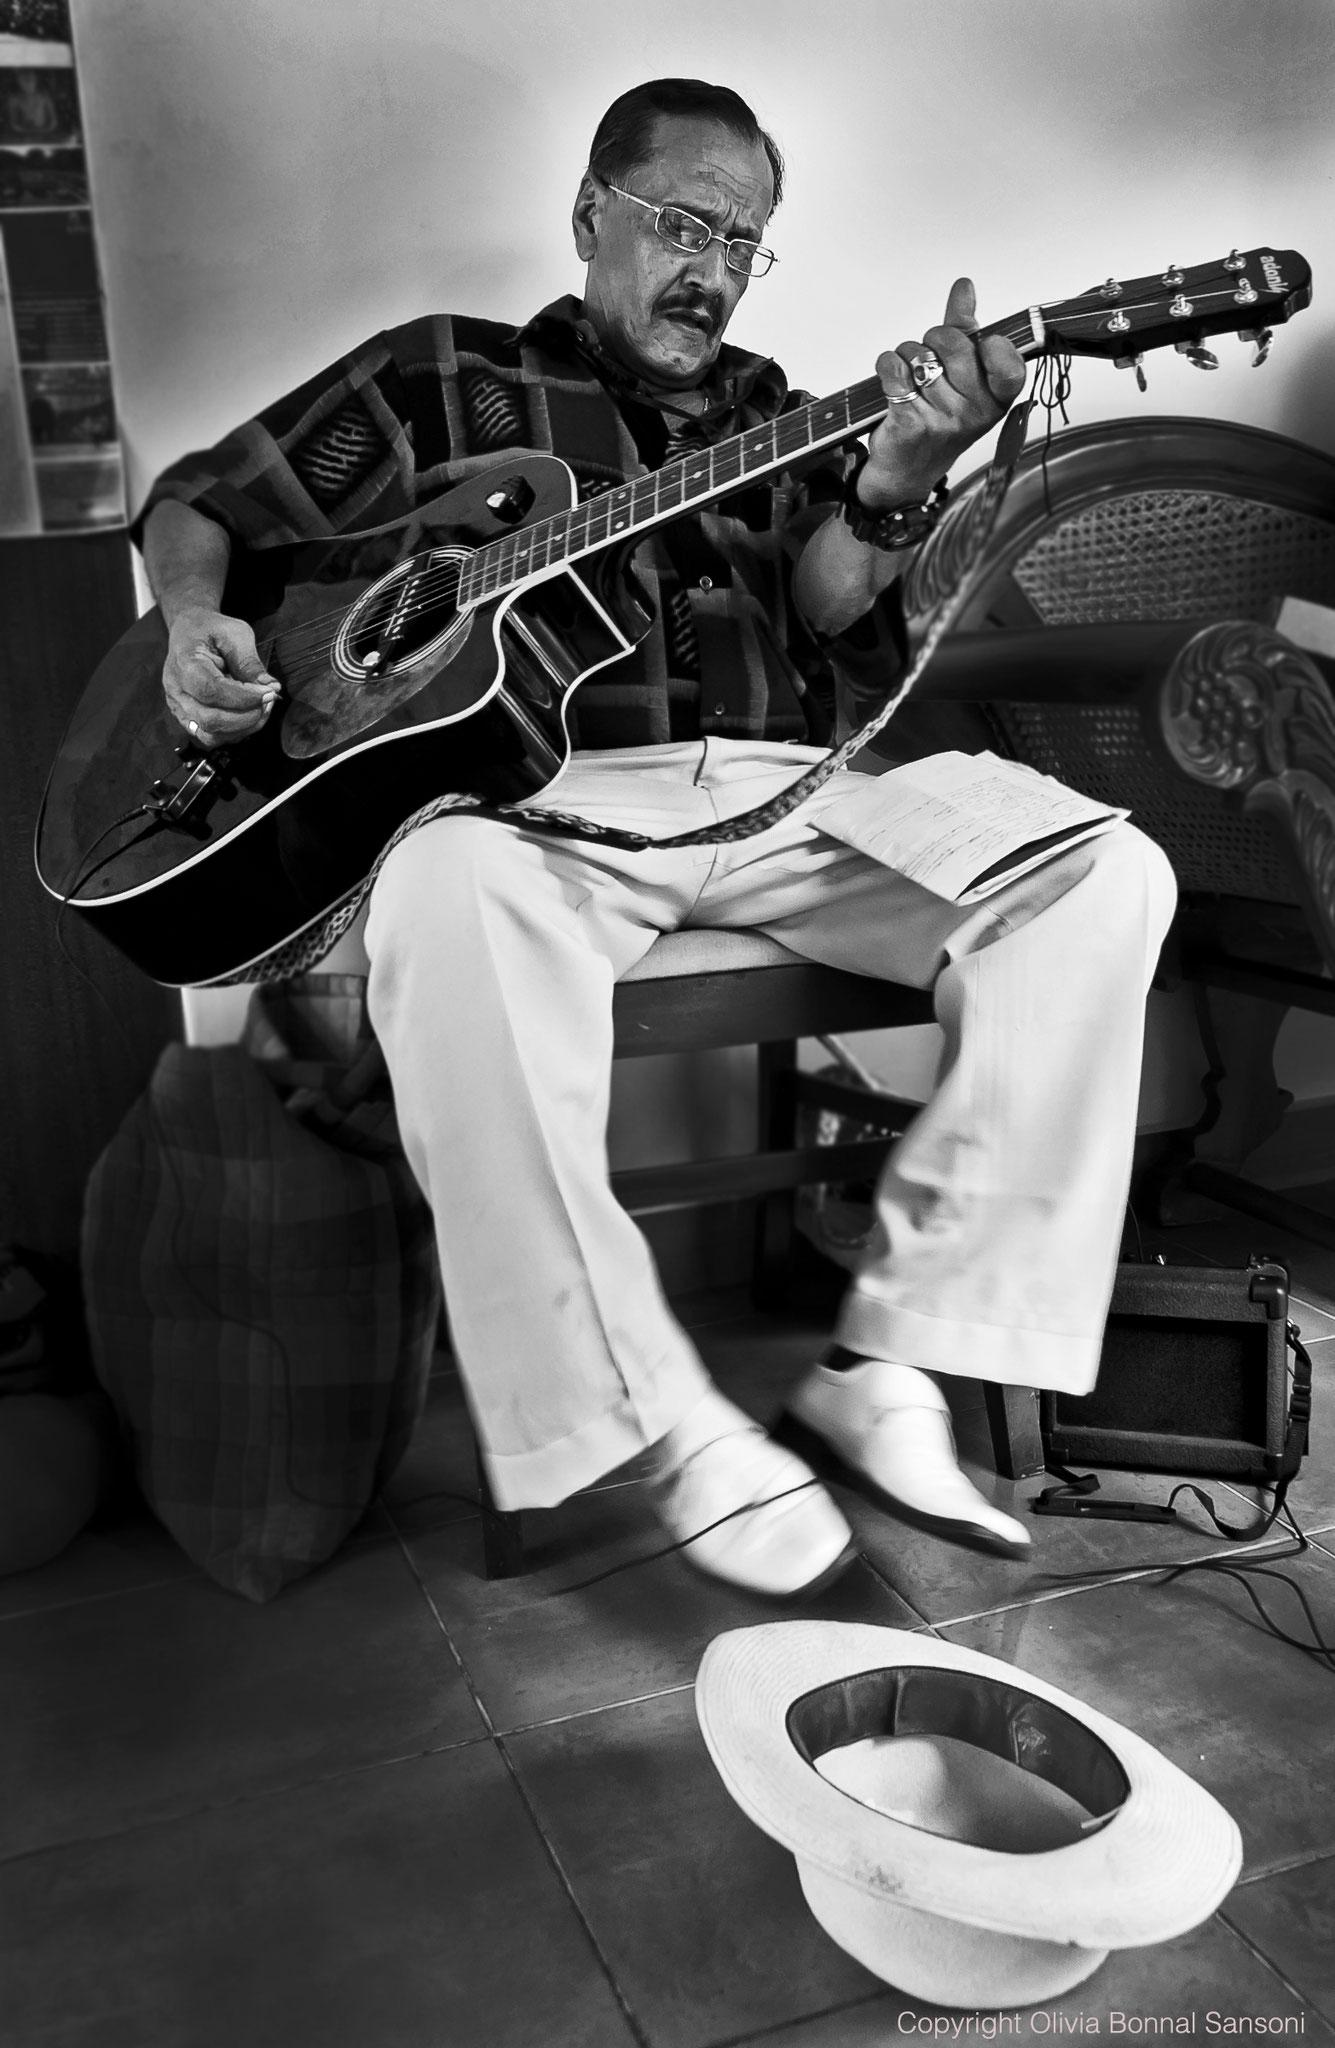 A country music fan, (Sri Lanka 2012) © OBS